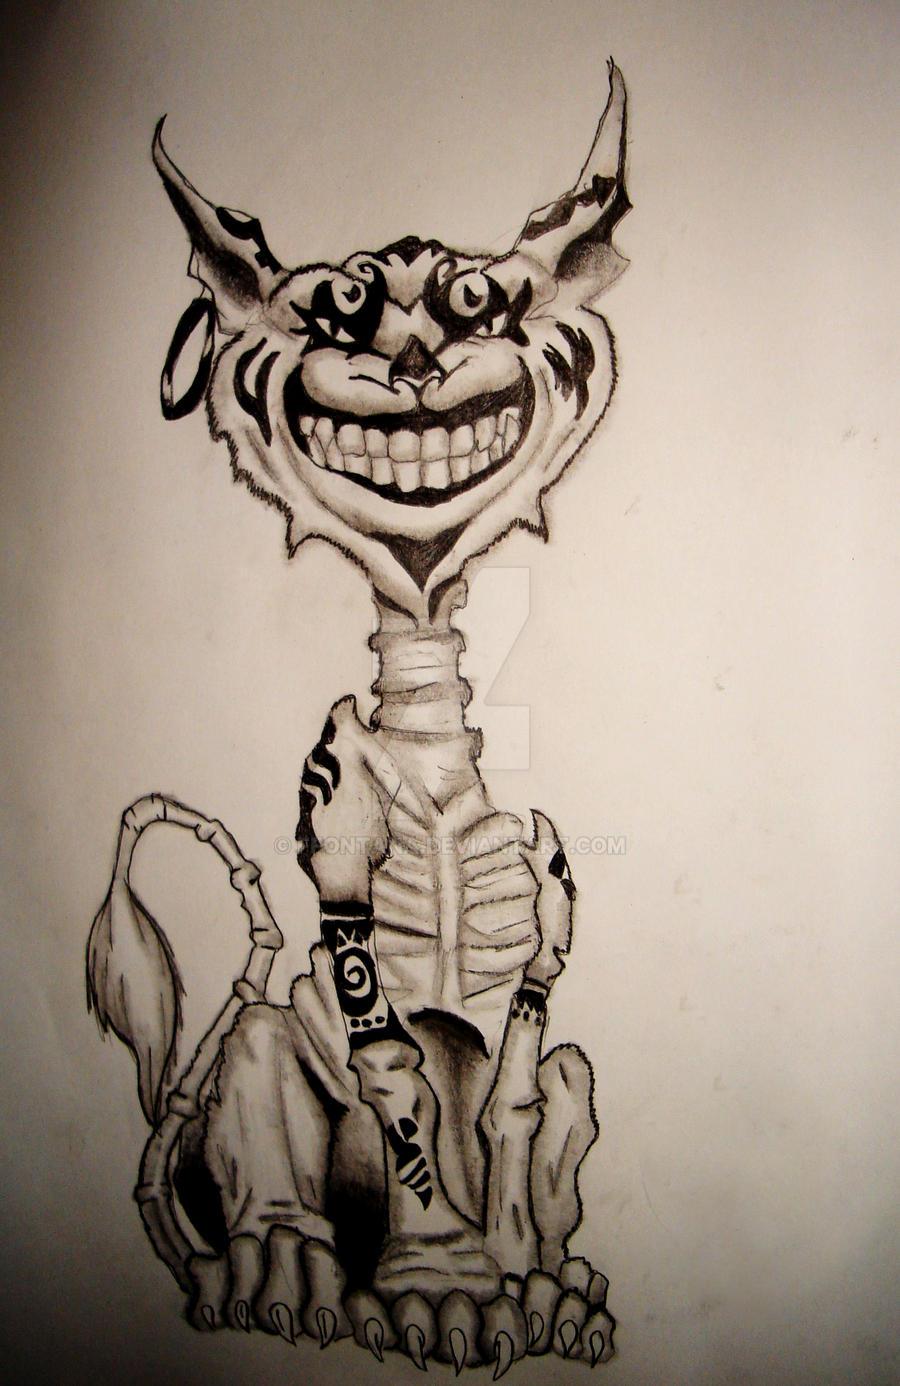 Sketch Evil Cheshire Cat By Ffontana On Deviantart